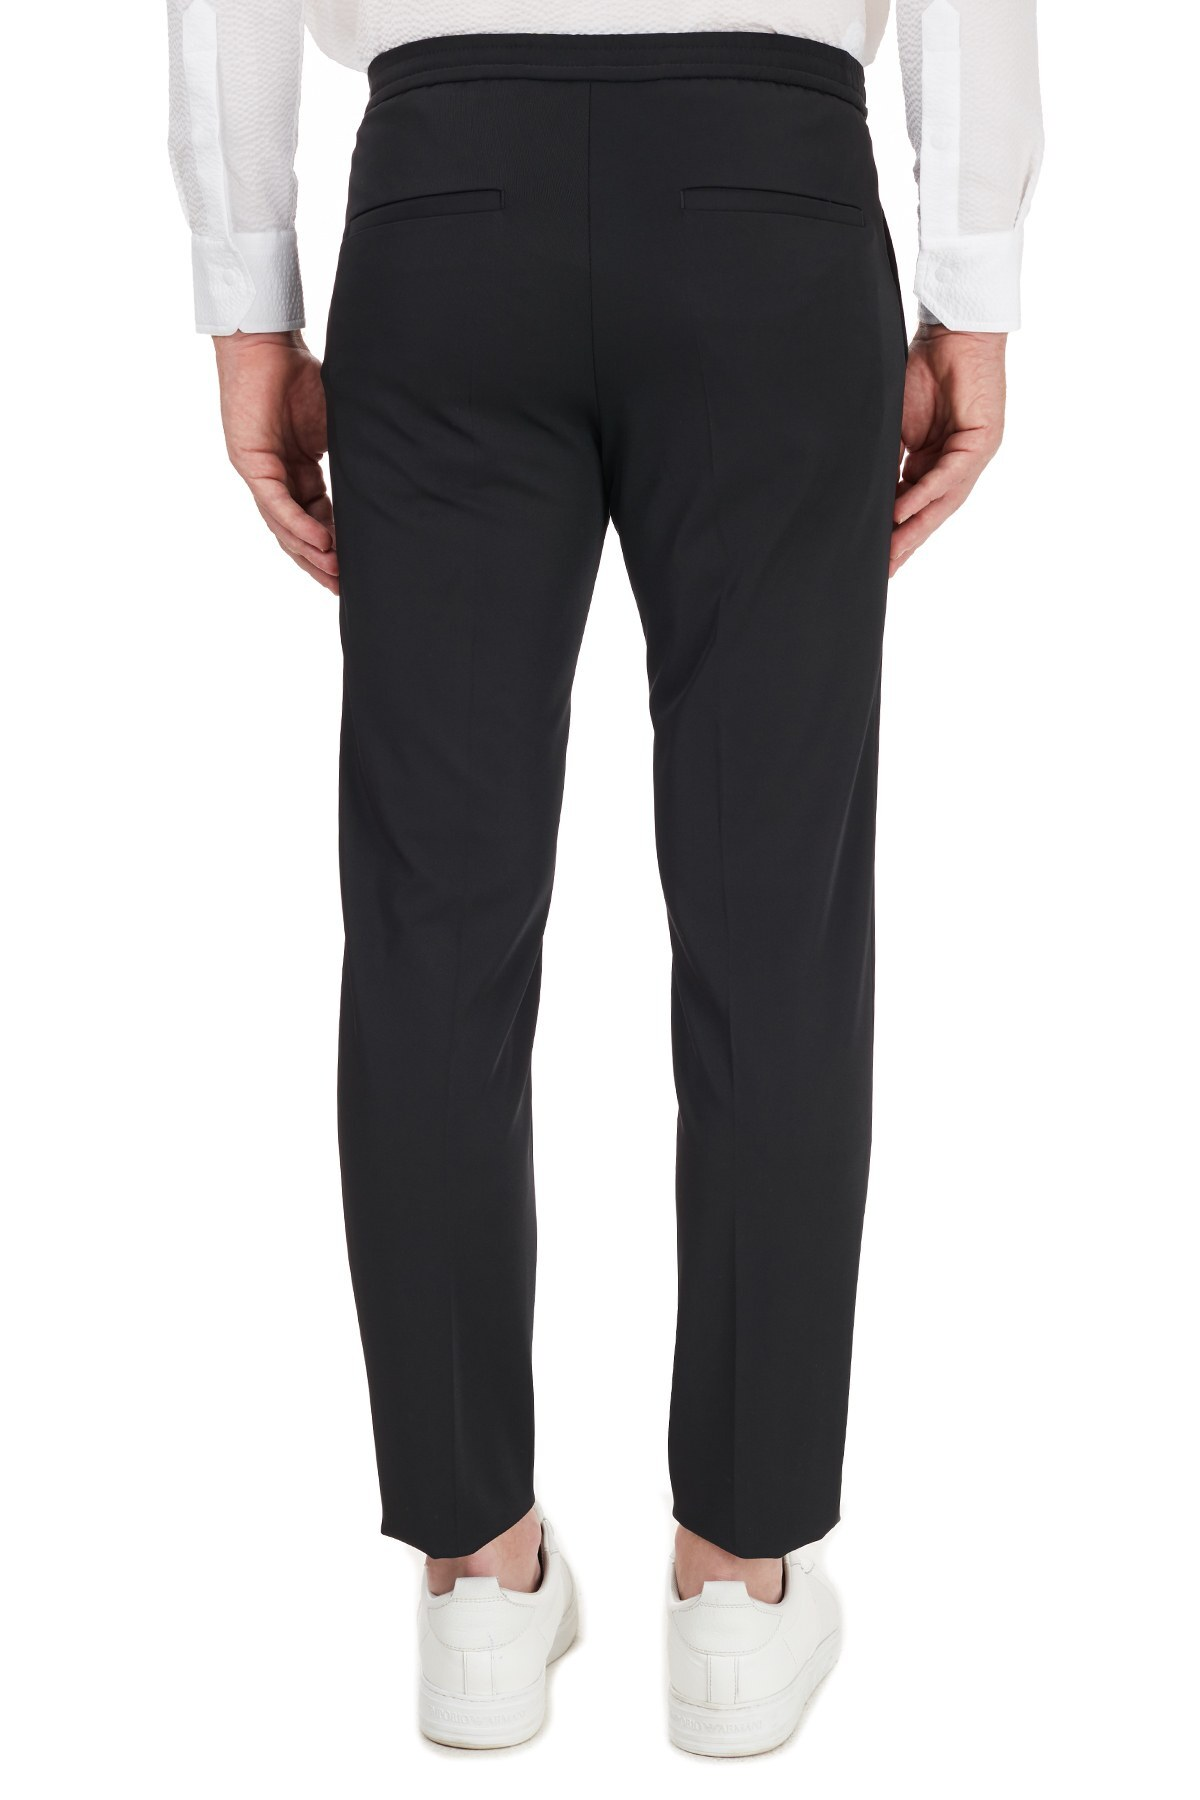 Hugo Boss Slim Fit Cepli Erkek Pantolon 50440340 001 SİYAH